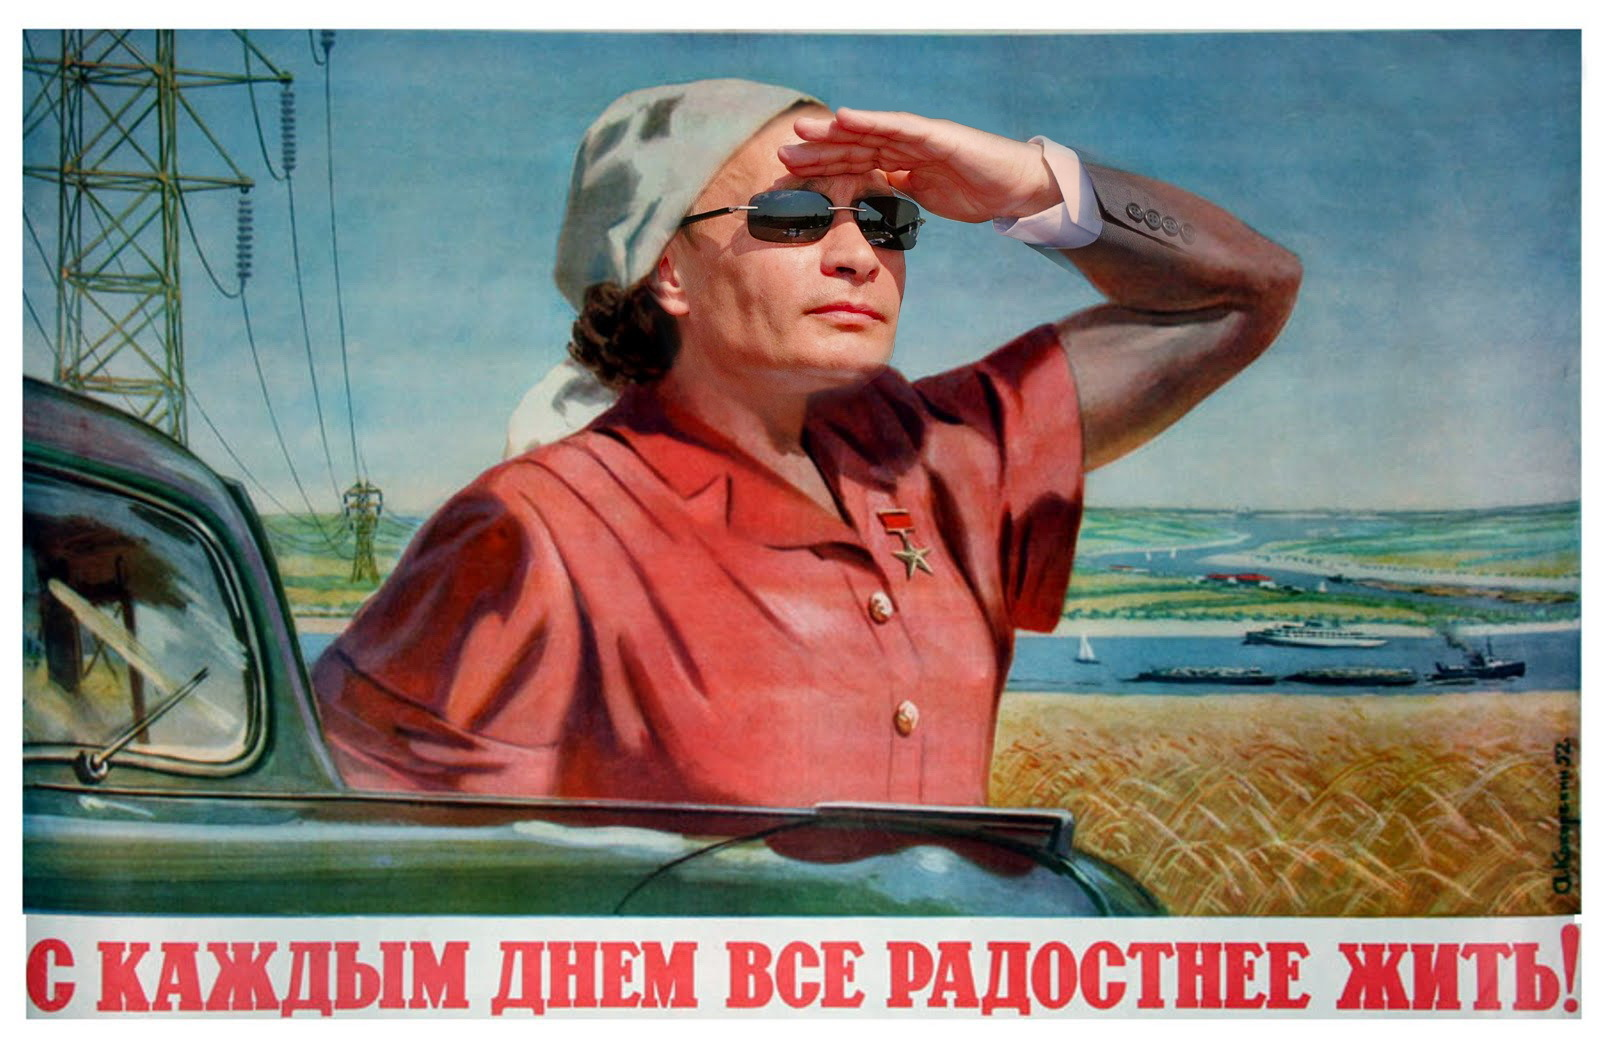 https://cs11.pikabu.ru/post_img/big/2018/06/09/7/1528543844174524793.jpg